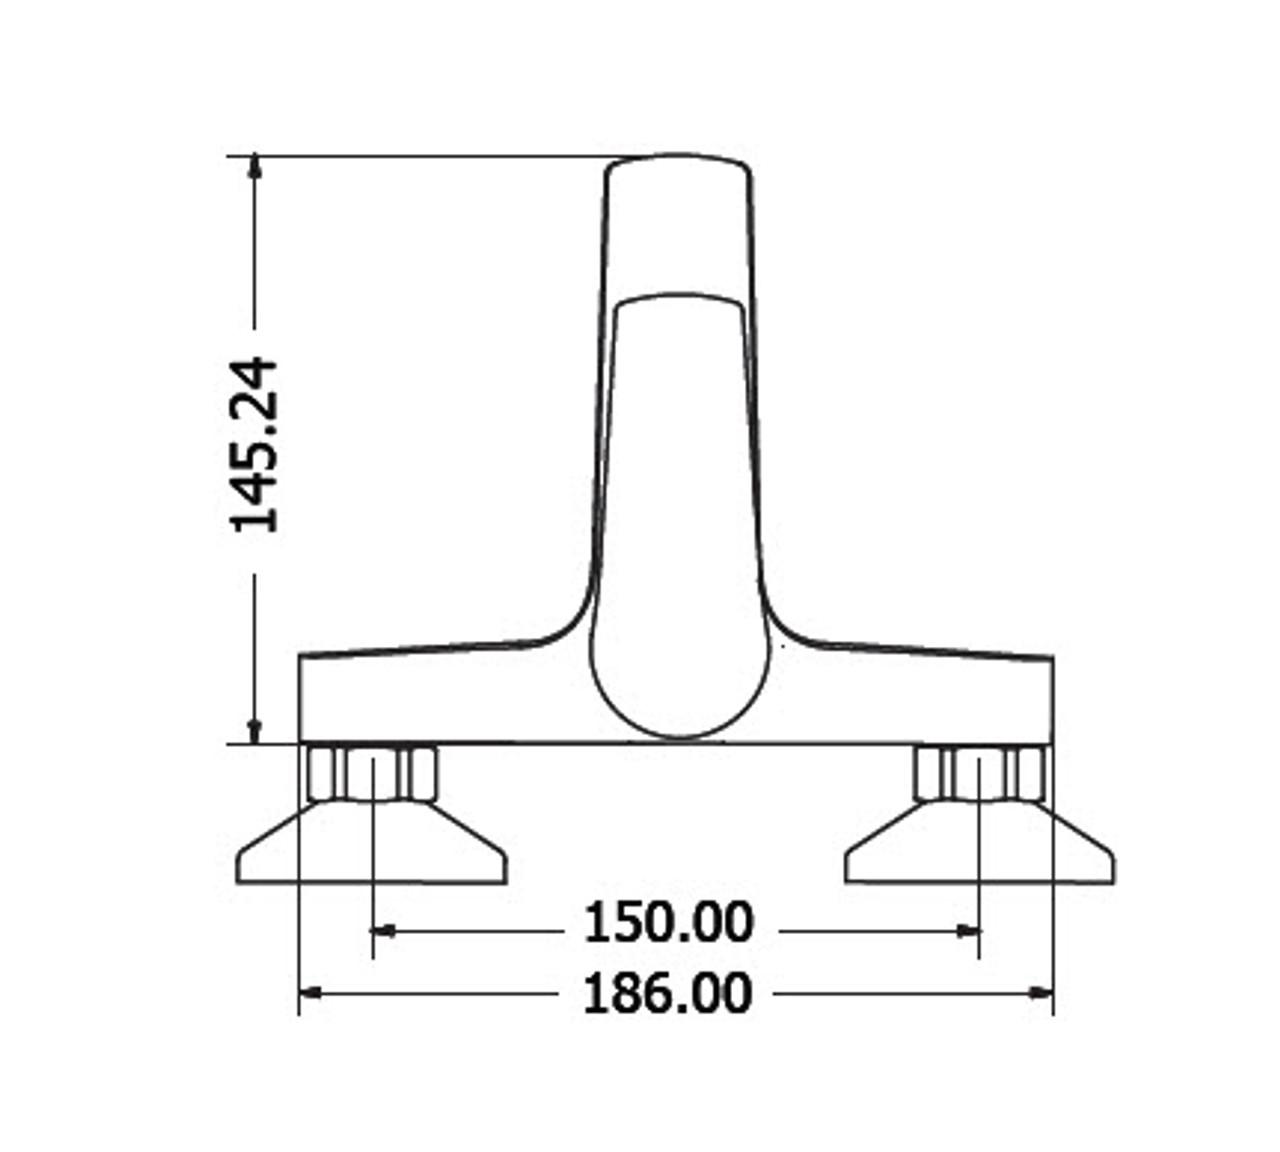 Bath Tub Faucet Chrome OPTIMA 00-2502 dimensions